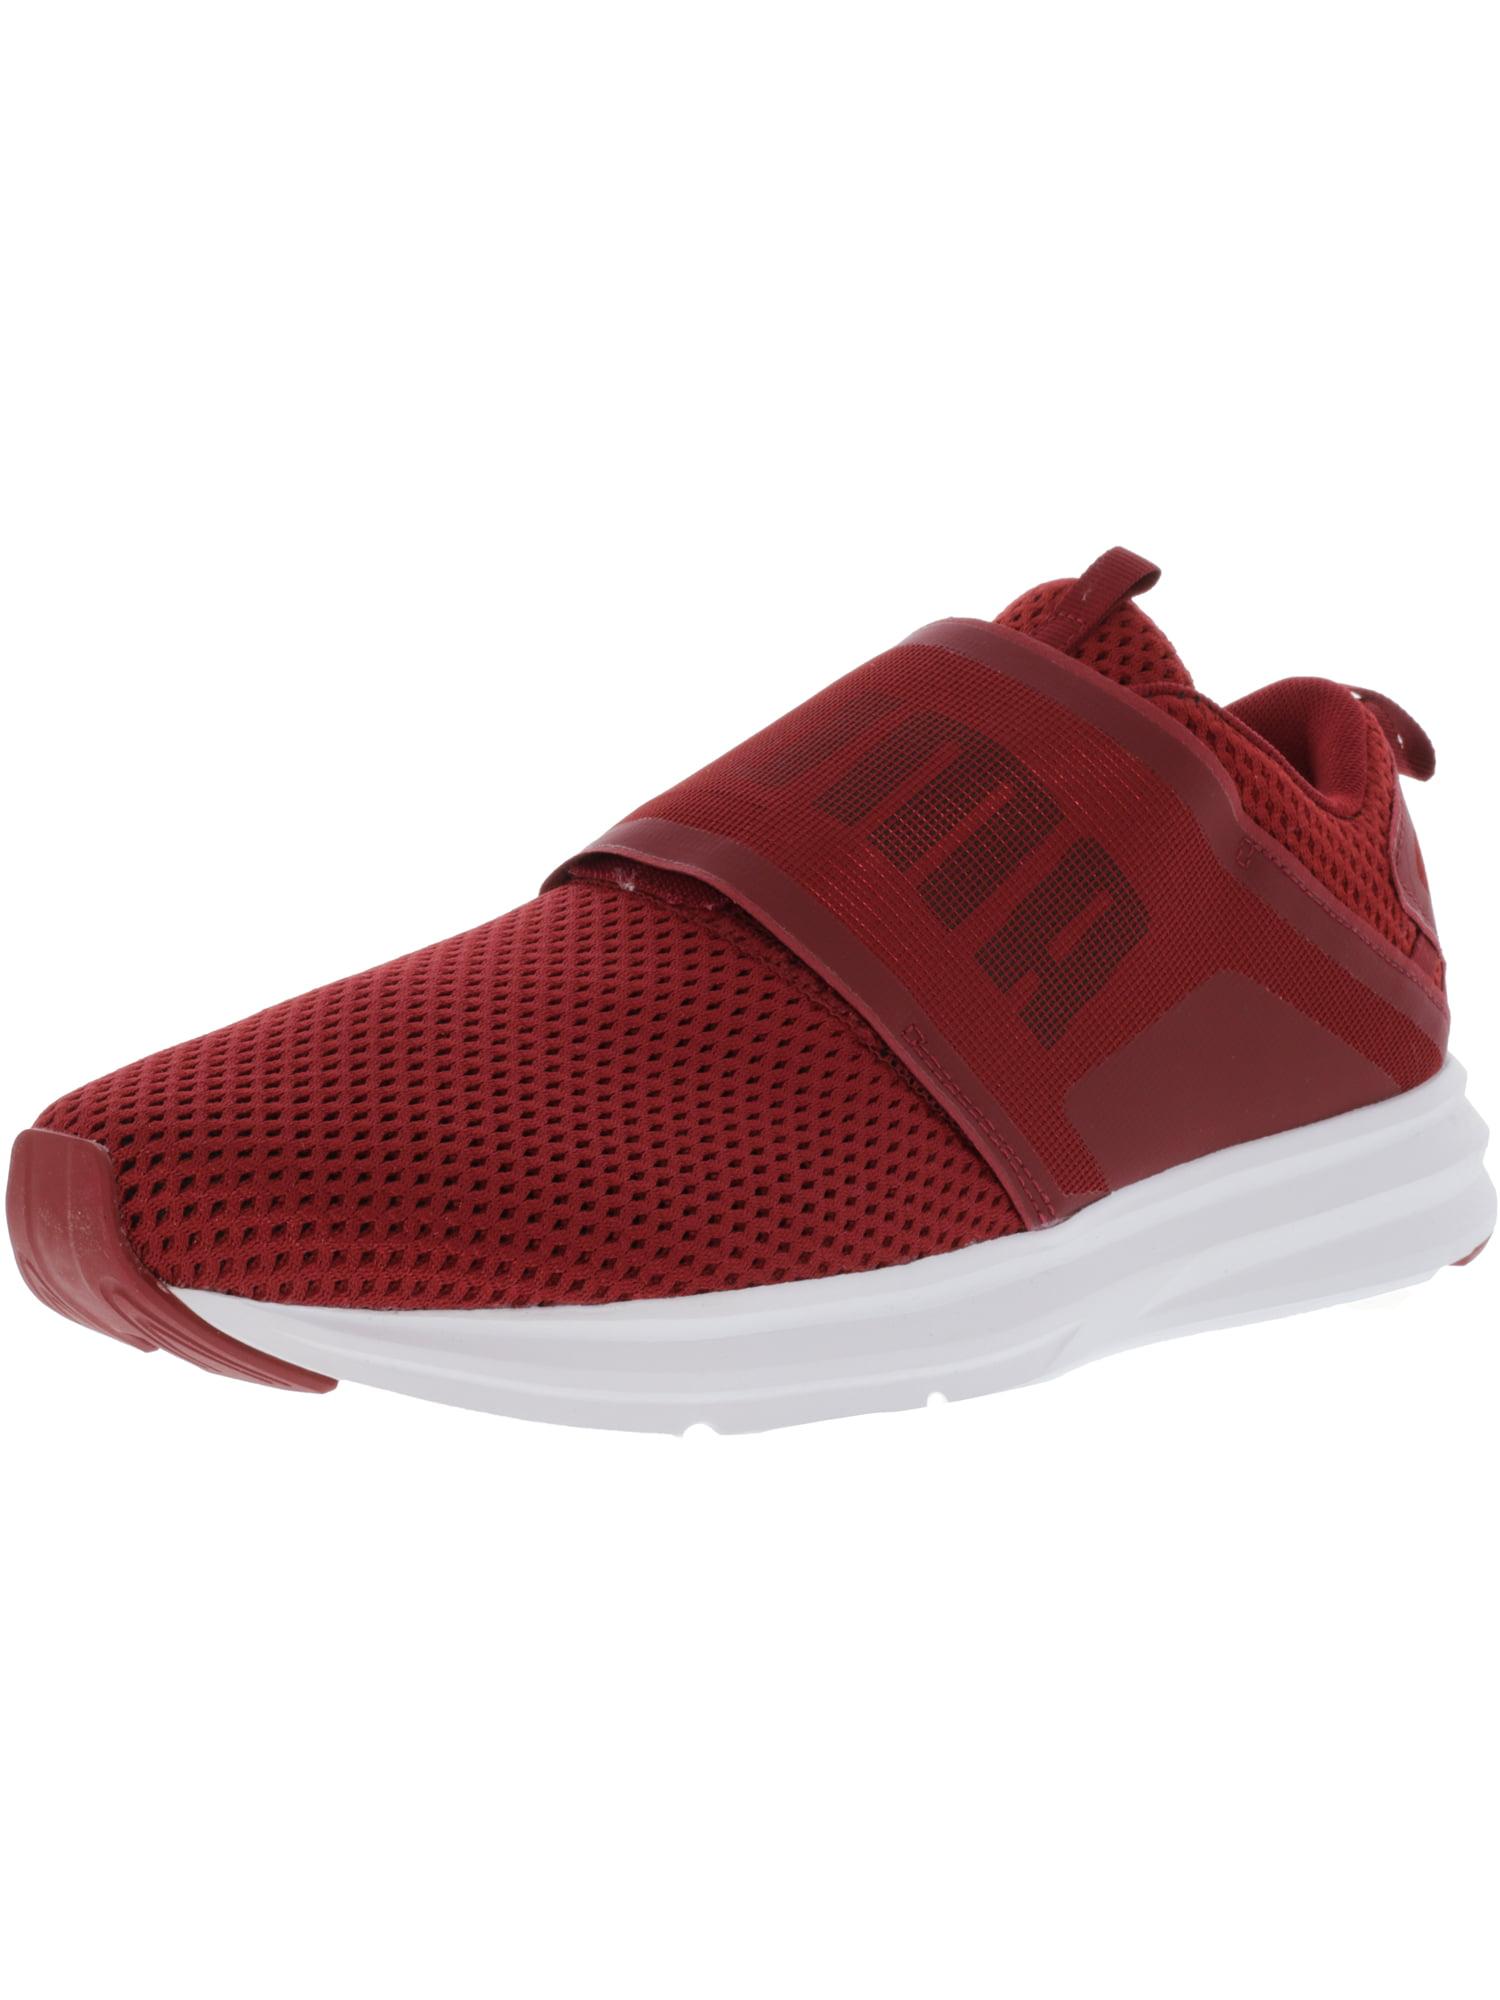 Puma Men's Enzo Strap Mesh Red Dahlia / Black Ankle-High Fabric Fashion Sneaker - 12M